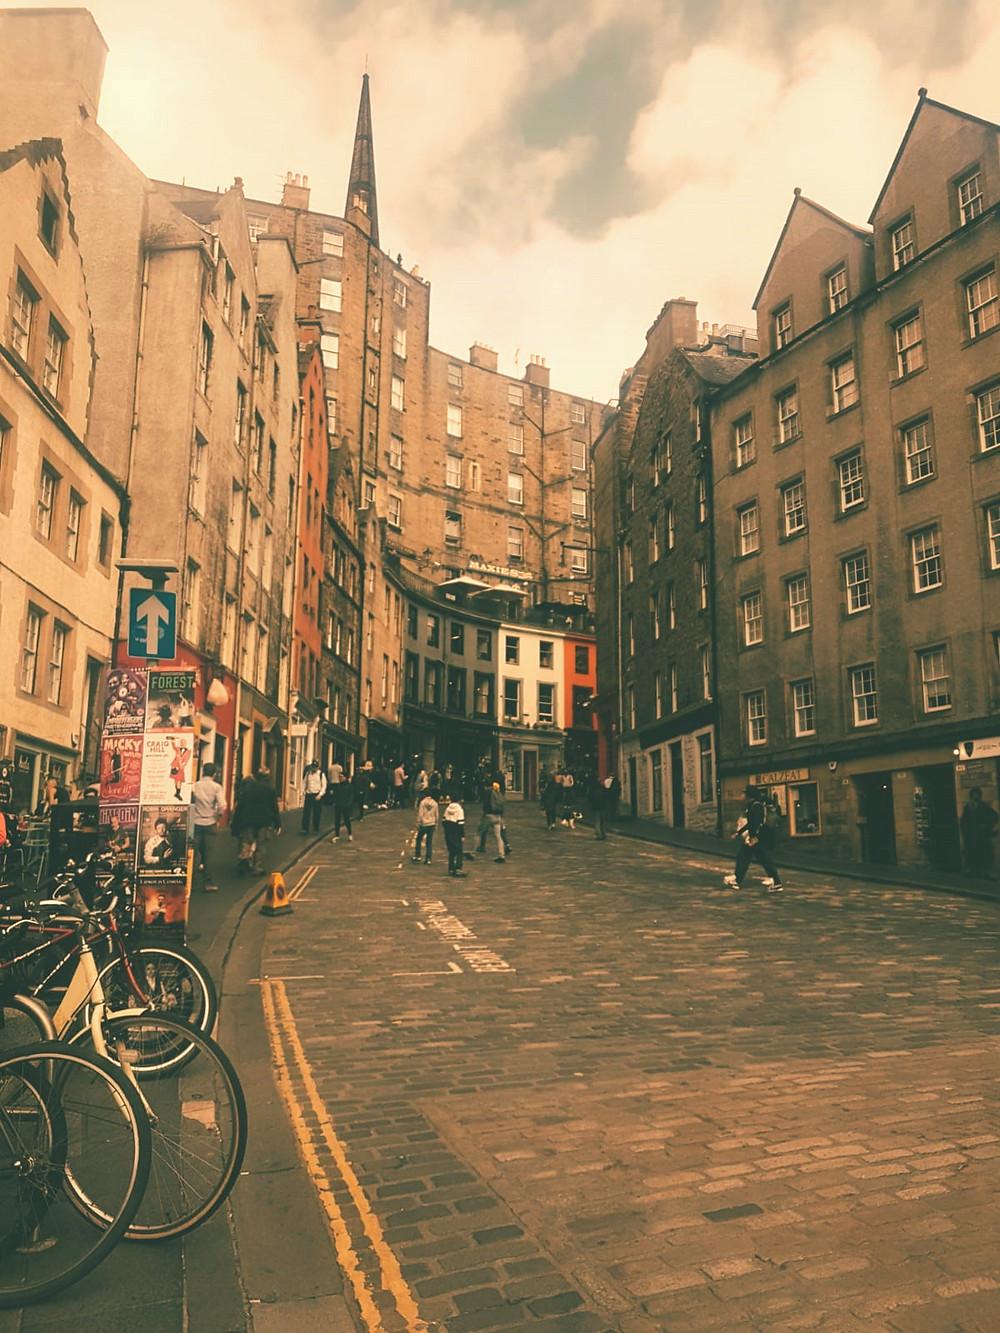 Victoria Street- Scotland's Diagon Alley